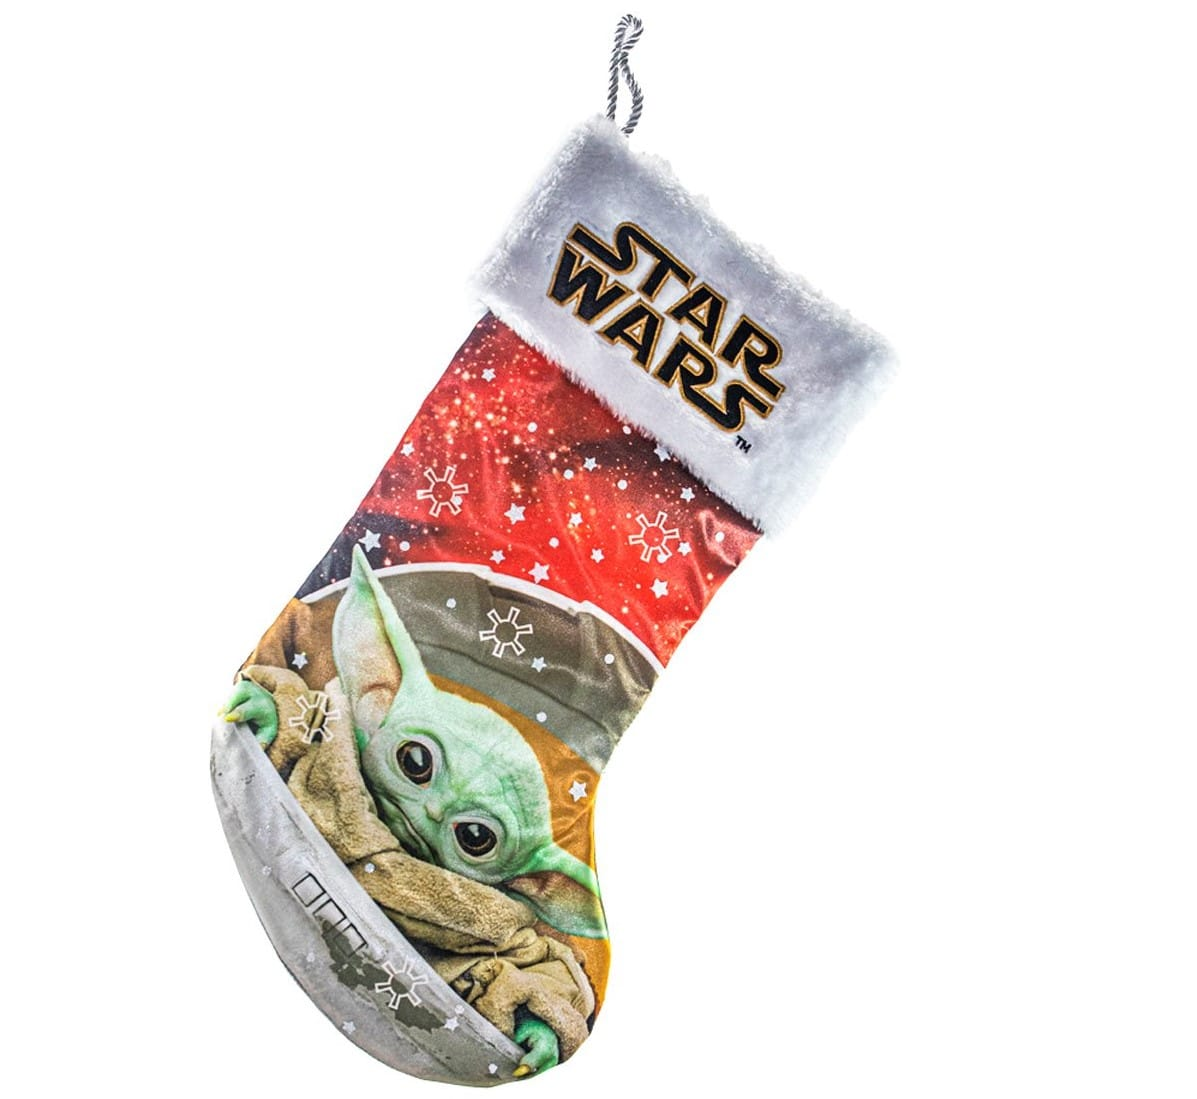 Baby Yoda Christmas stockings, nutcracker and snow globe make us feel like it's Christmas in June 12